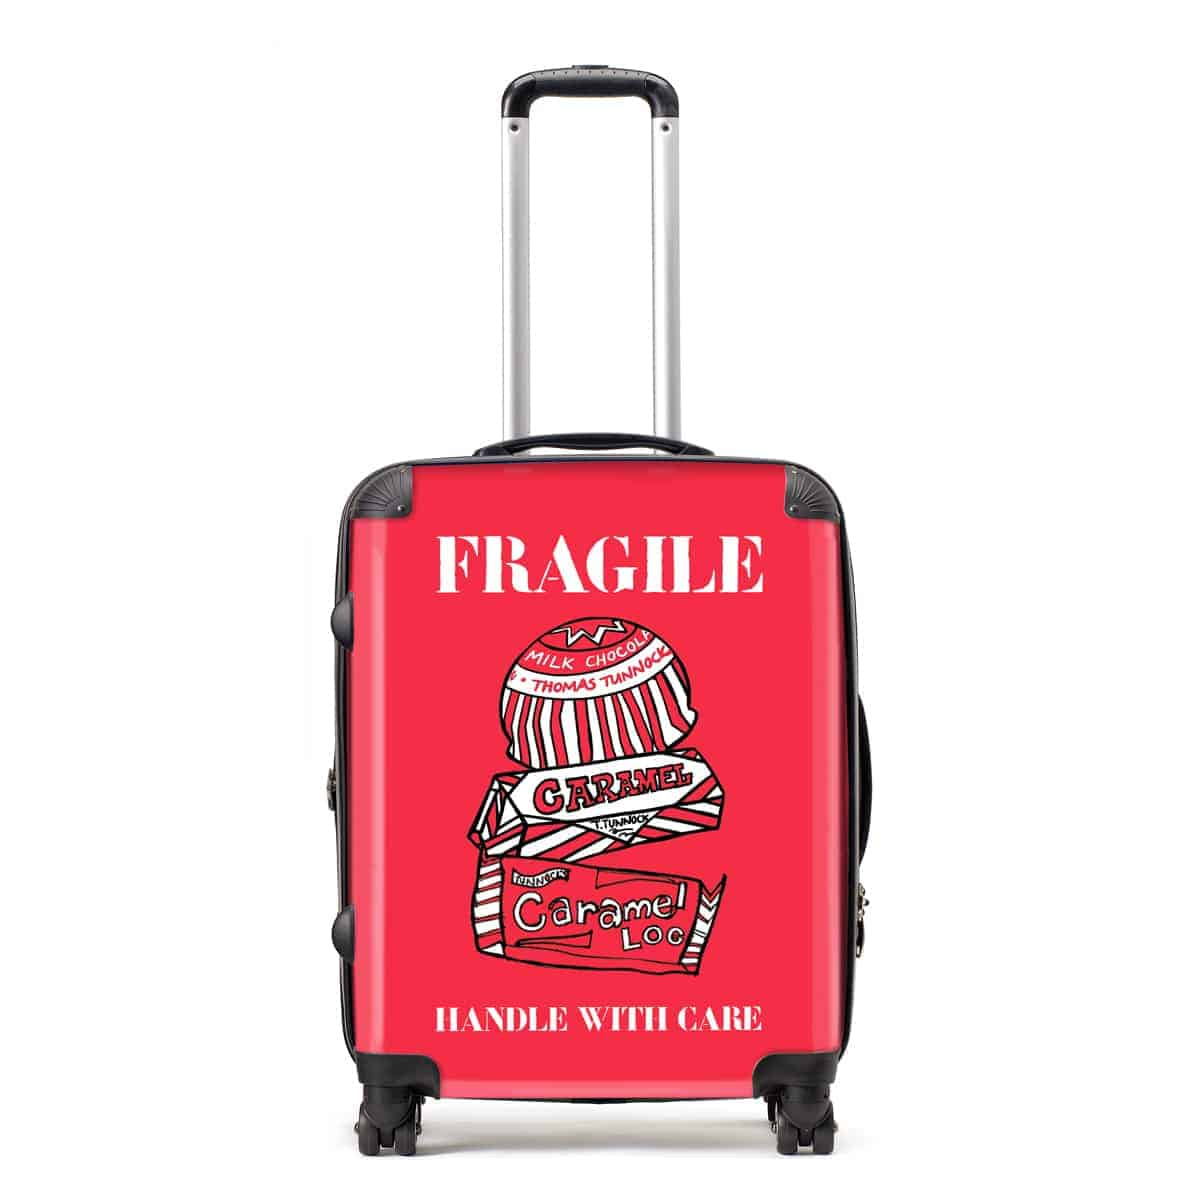 Tunnocks Fragile suitcase